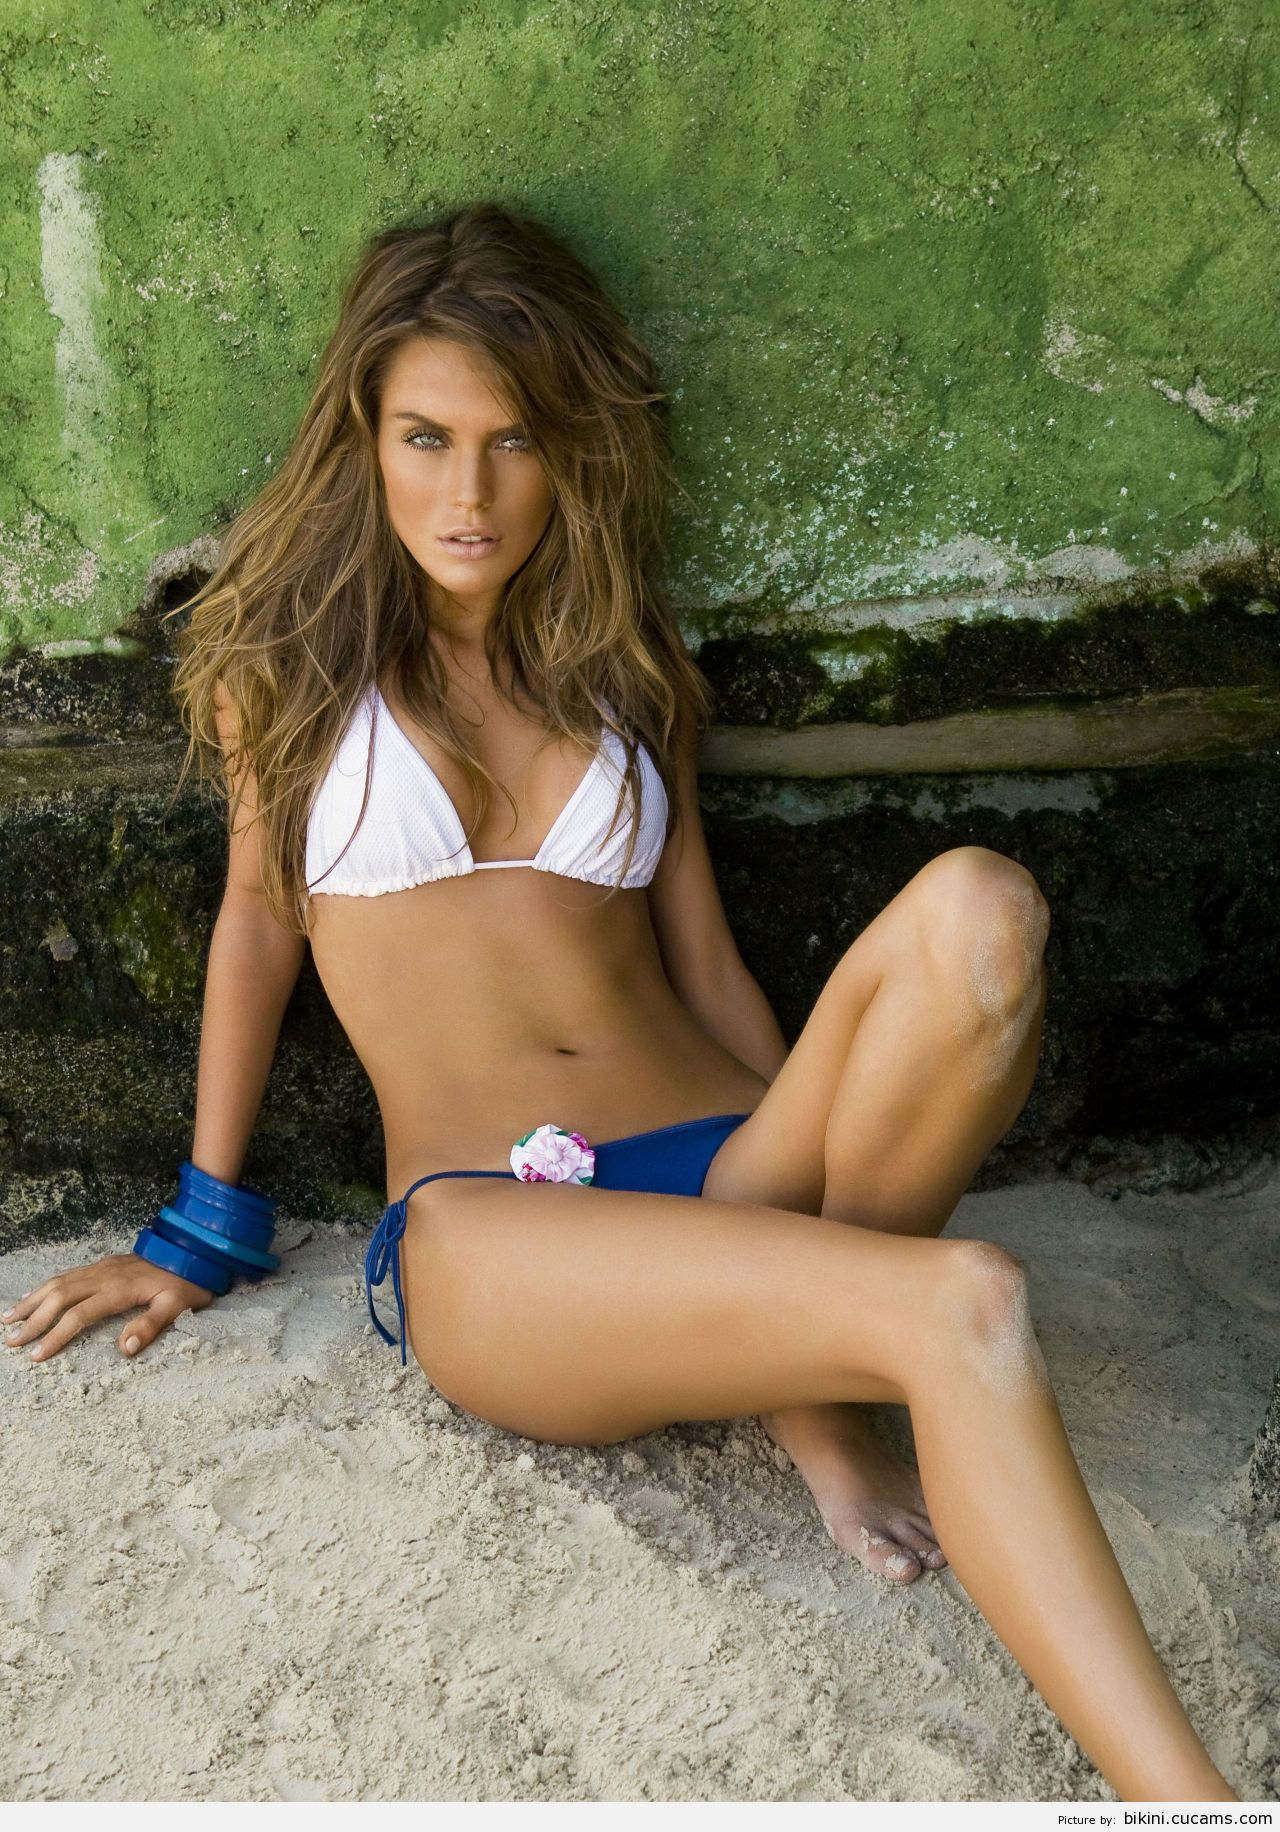 Bikini Reverse Messy by bikini.cucams.com